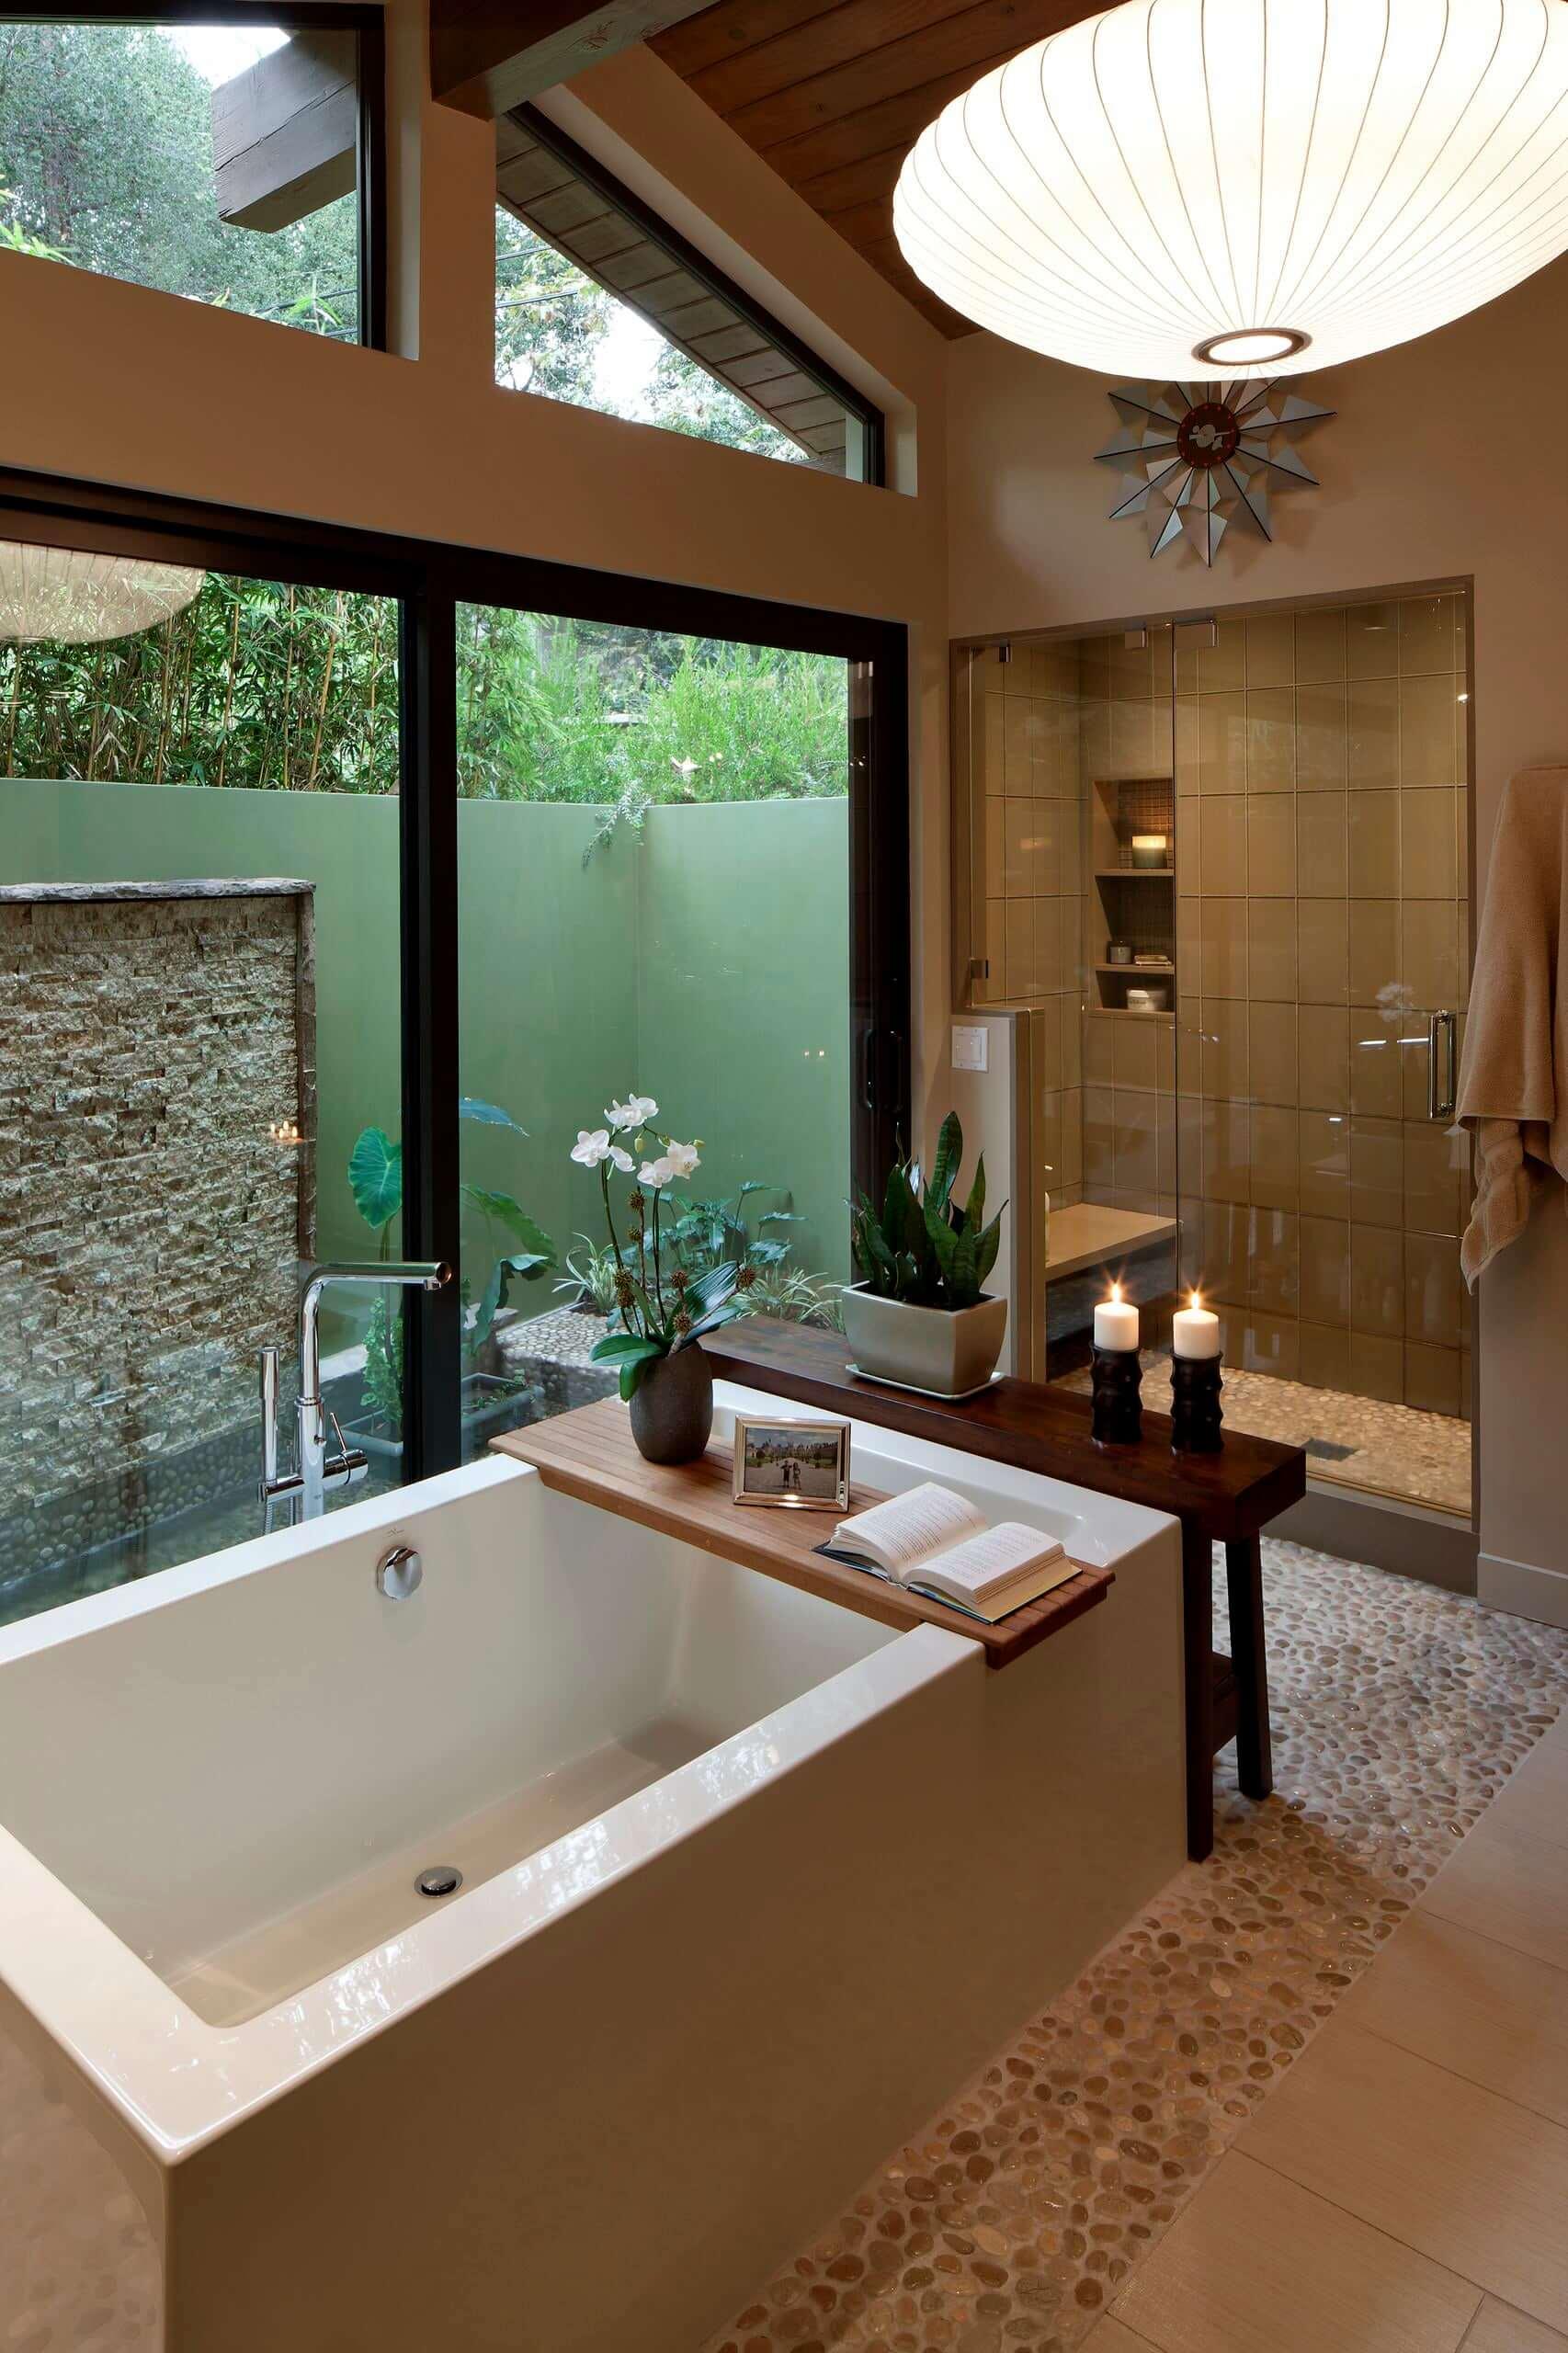 thiết kế spa mini tại nhà